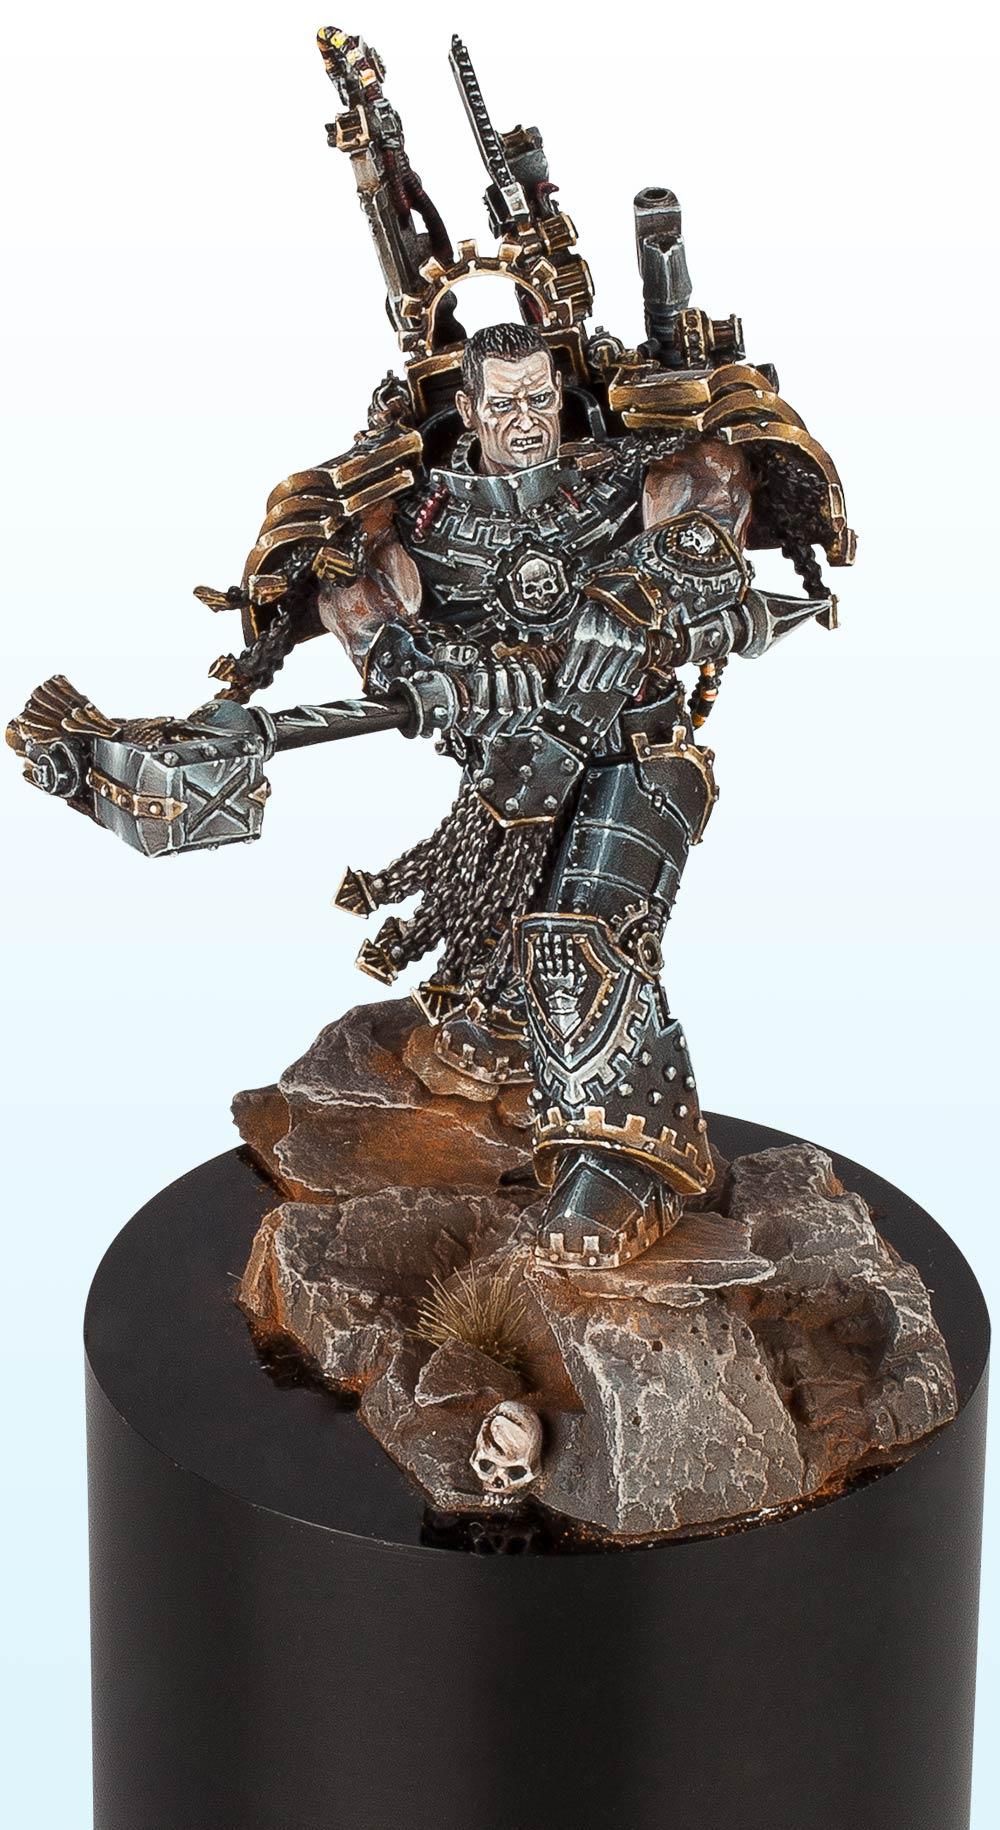 Warhammer 40,000 Large Model: Gold – 2014